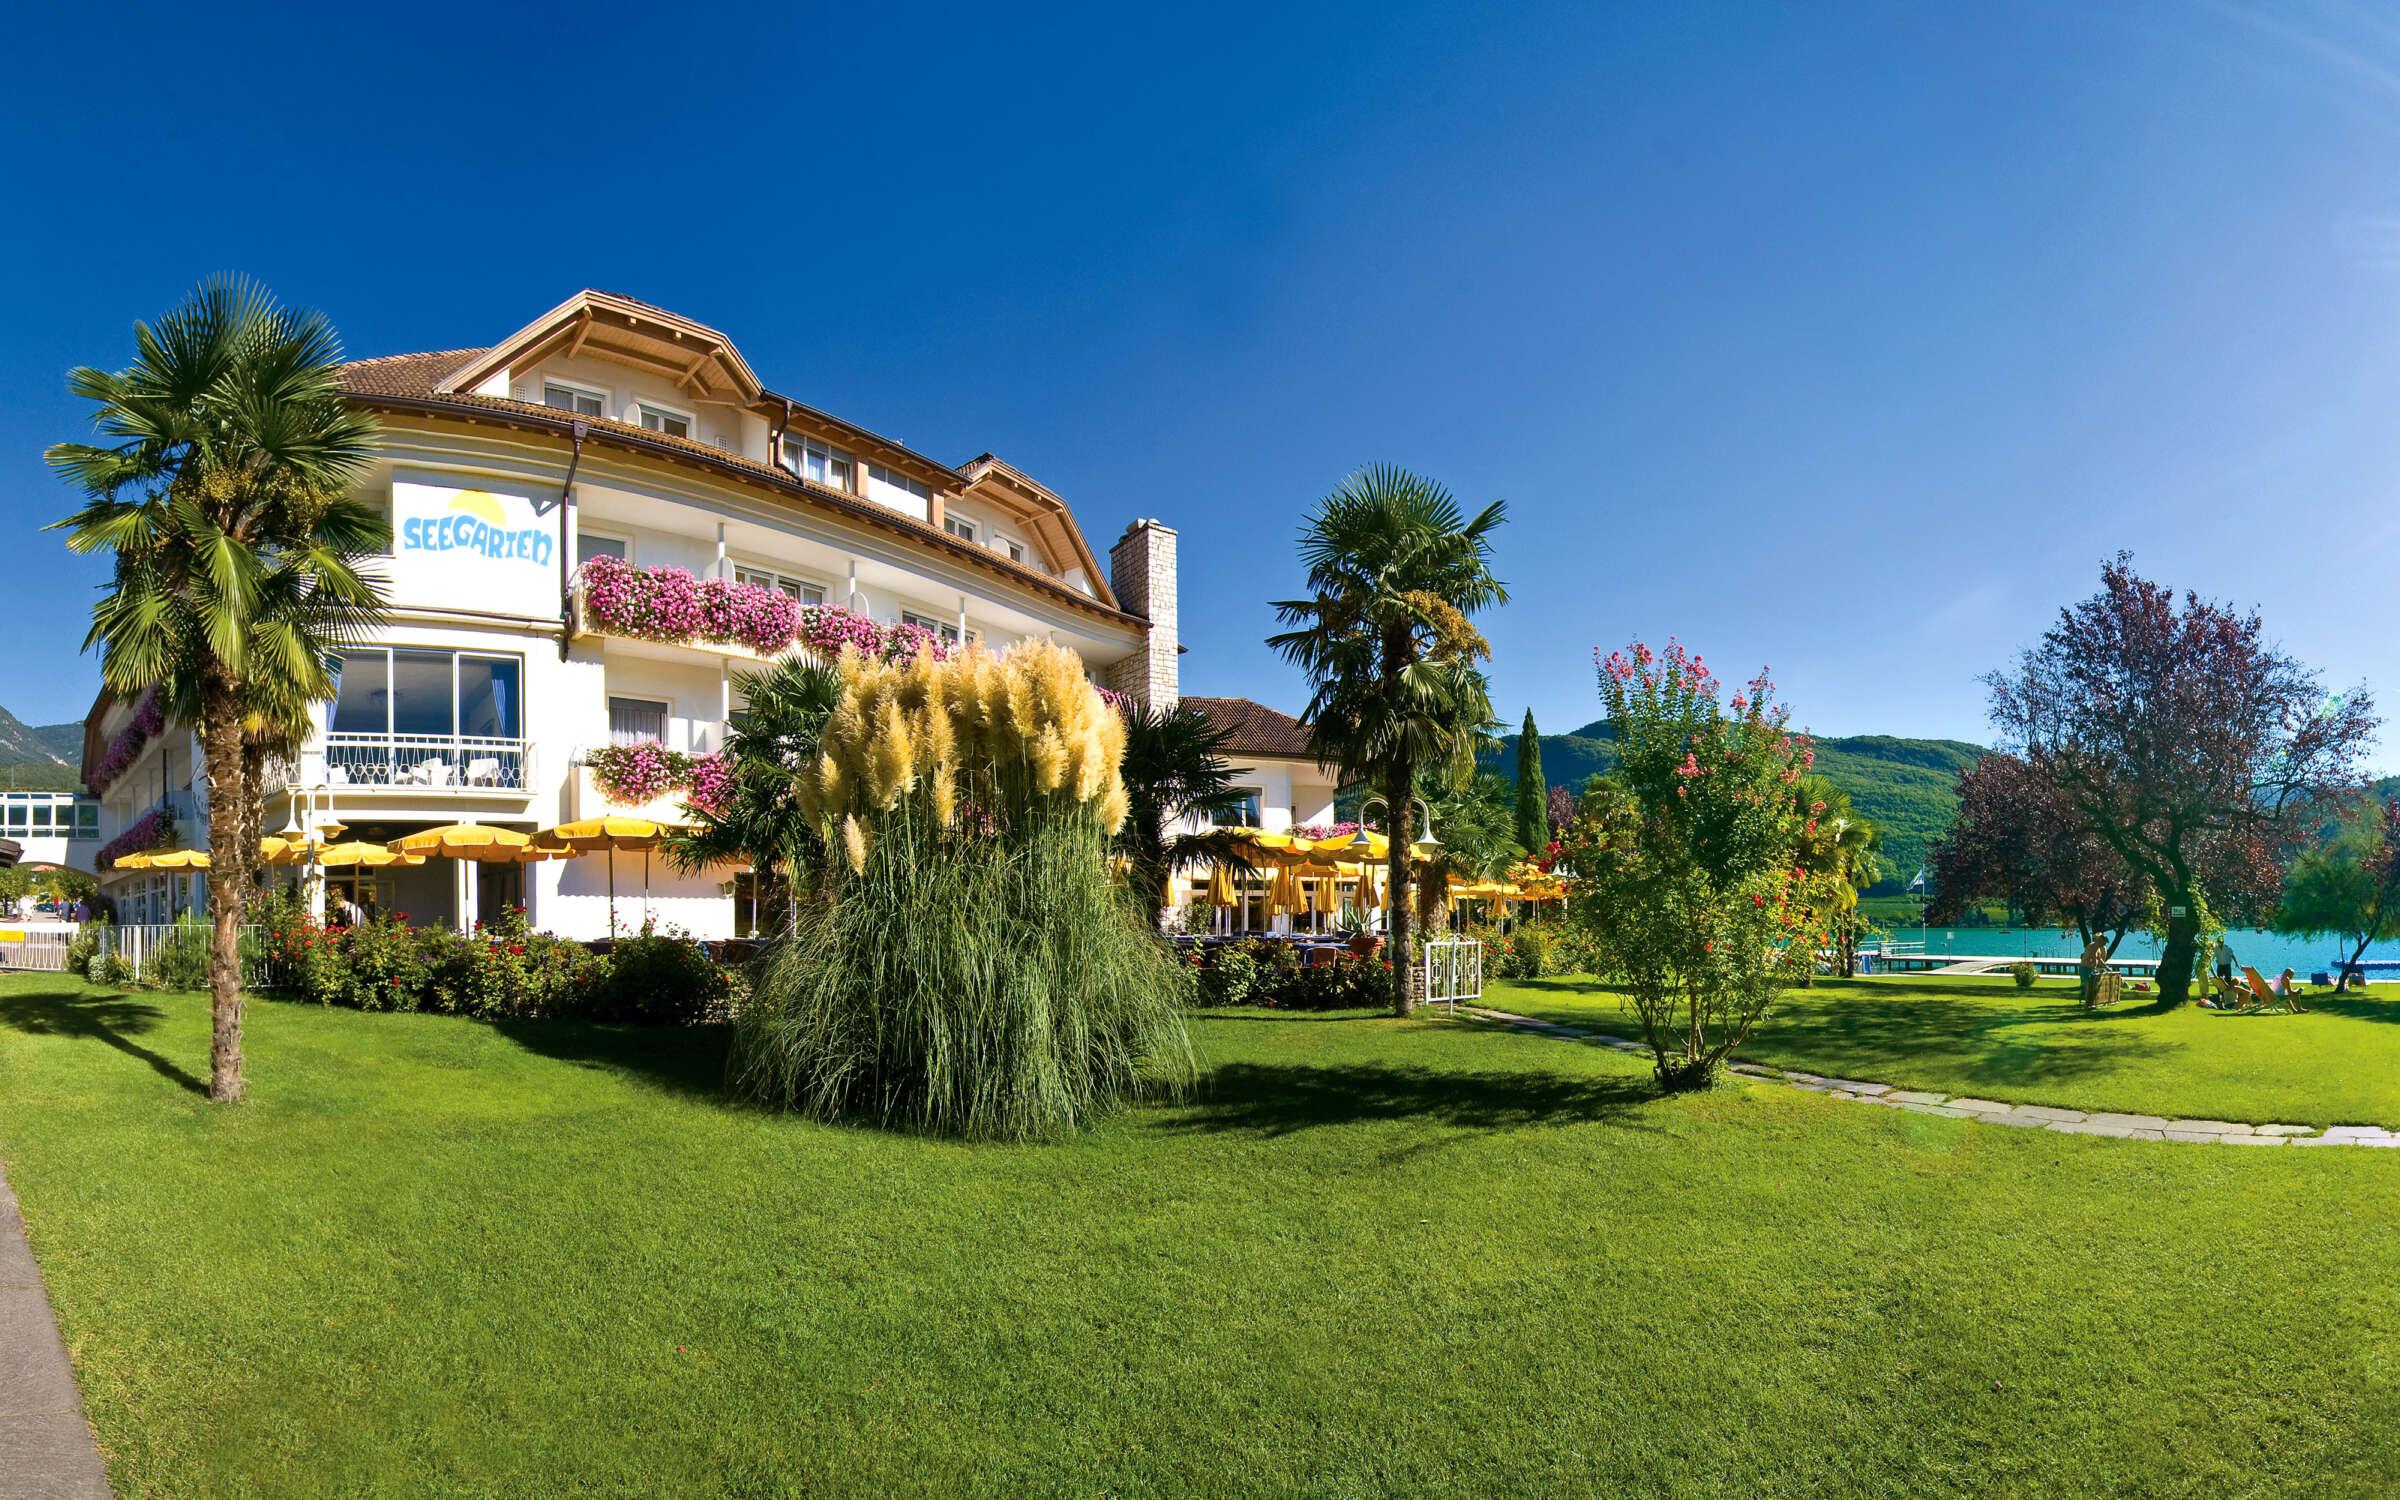 Hotel Panorama 01 Var